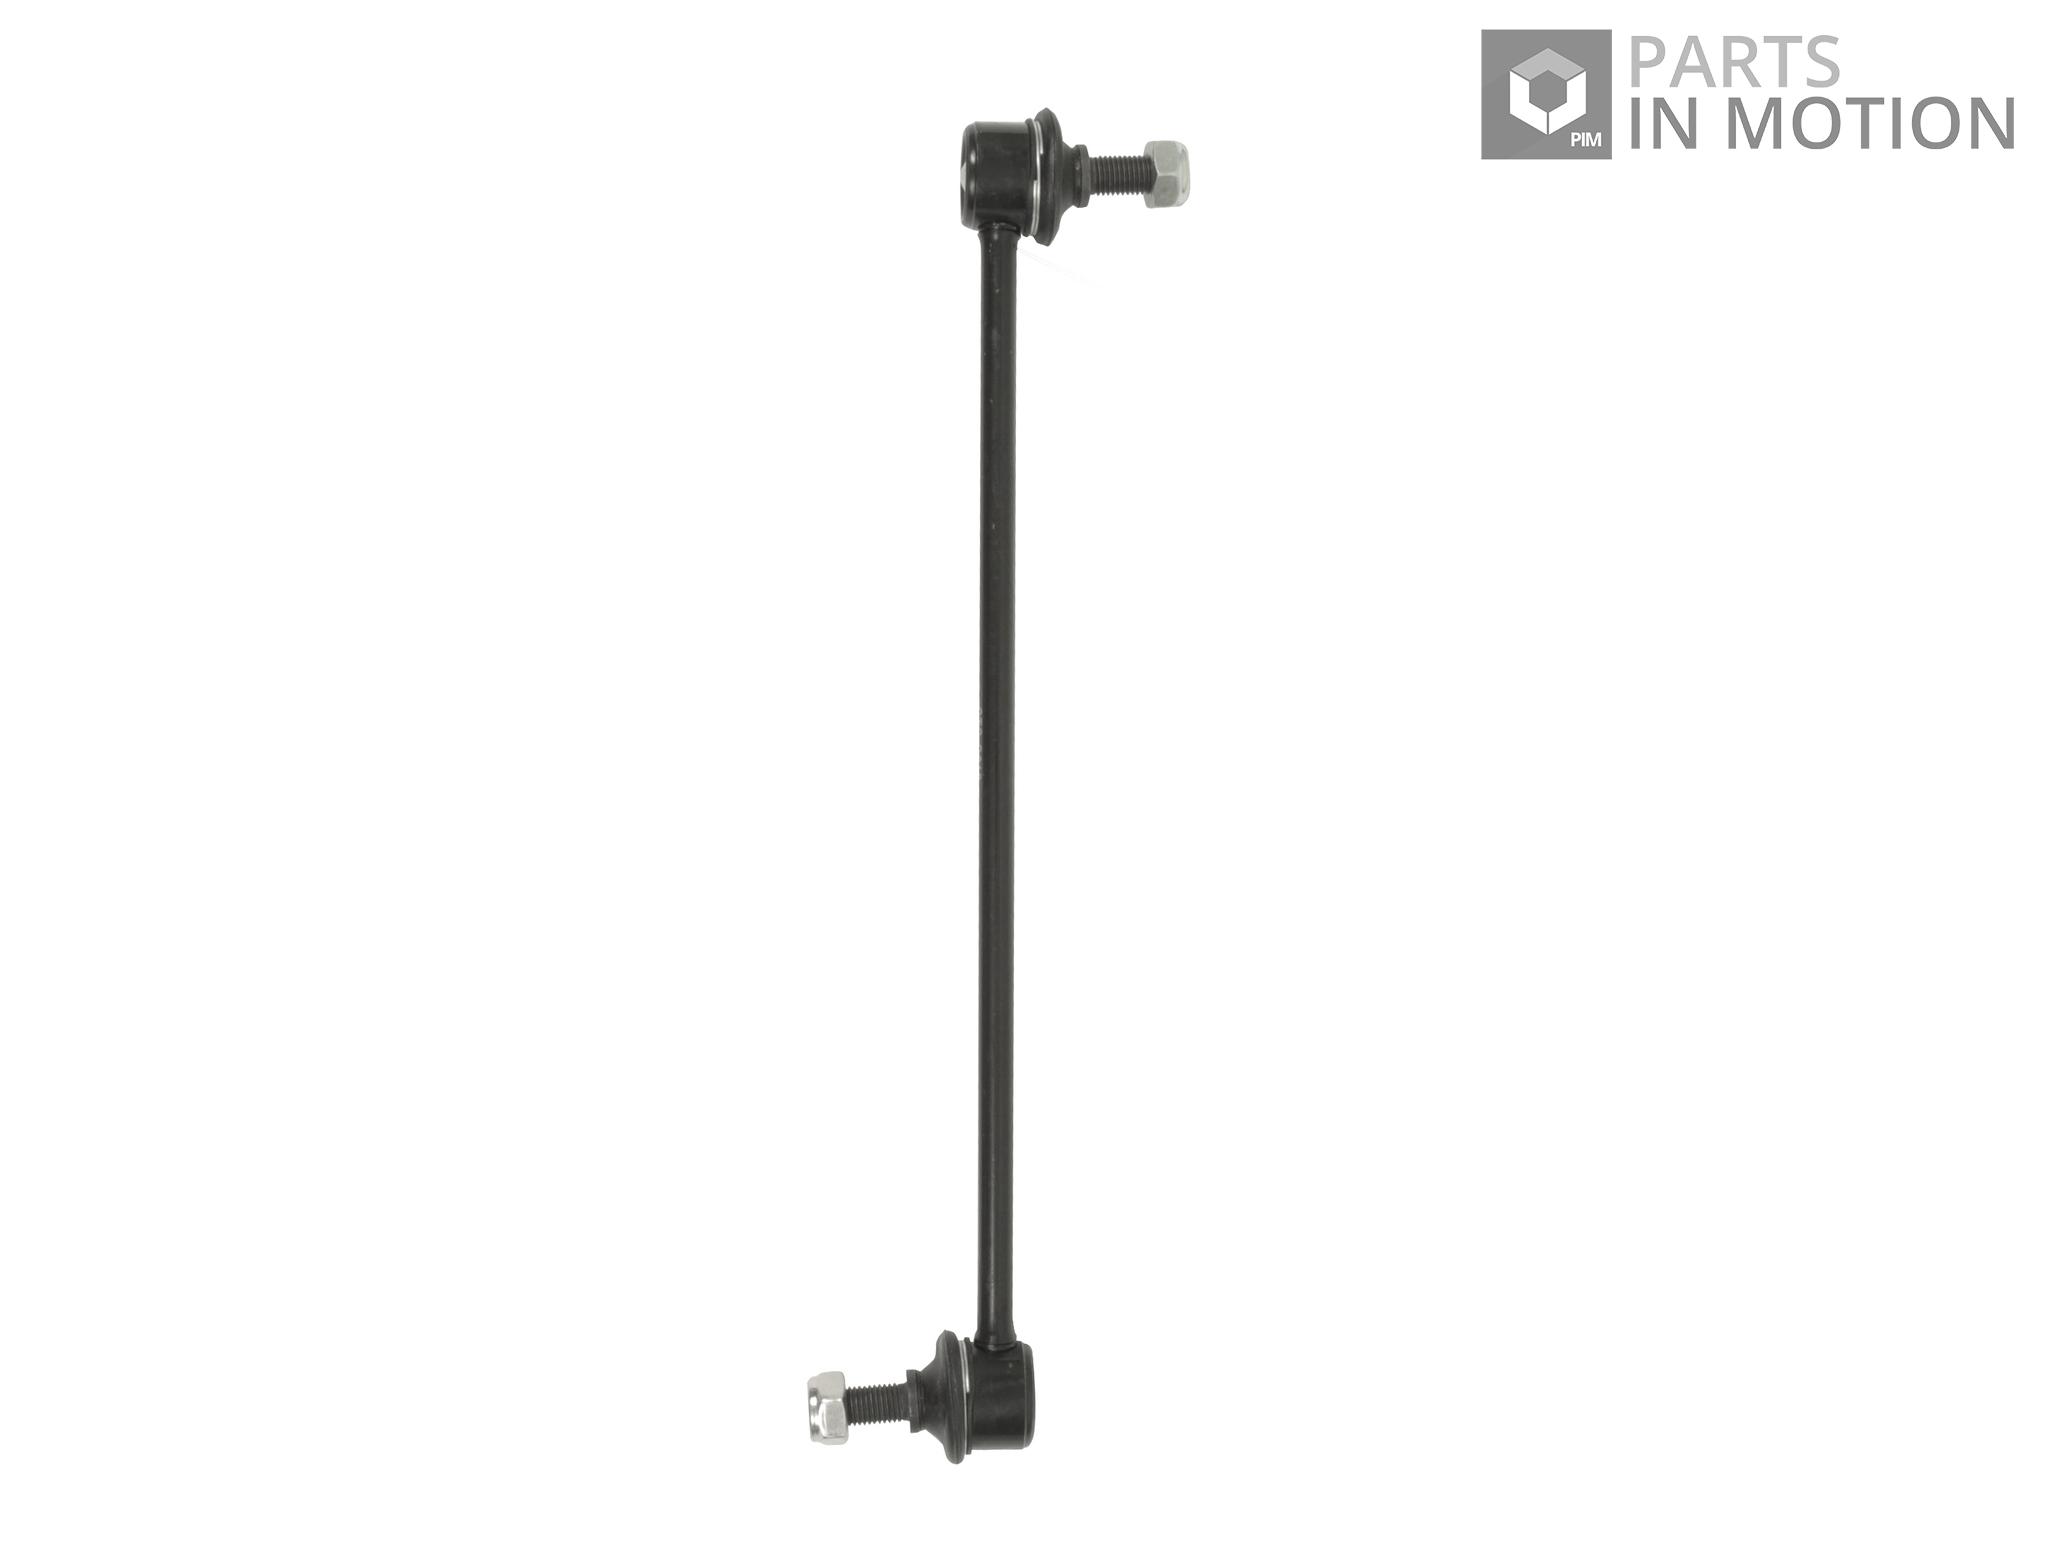 VOLVO V50 545 Anti Roll Bar Link Rear Left or Right 2.0 2.0D 03 to 12 Stabiliser